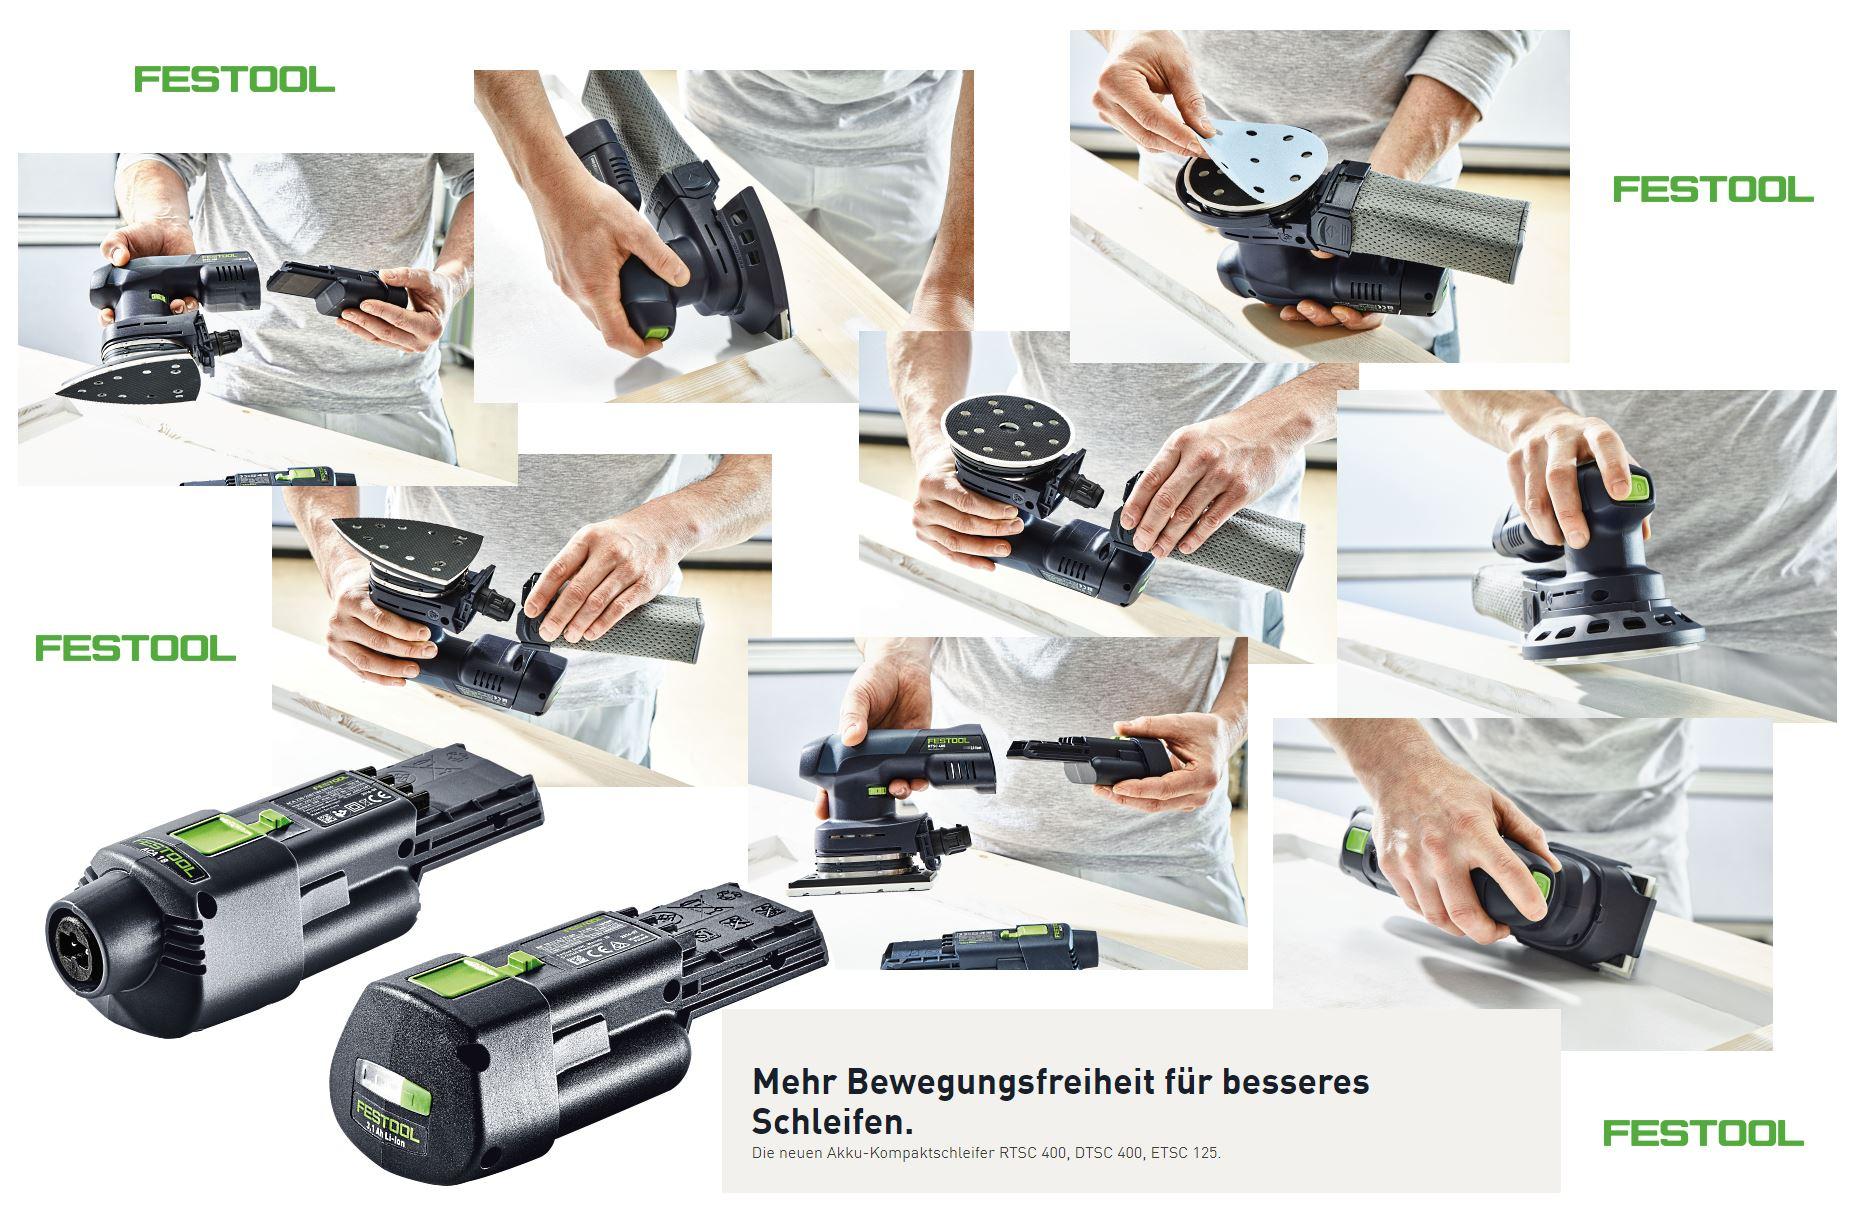 festool bringt neue akku-kompaktschleifer rtsc 400, dtsc 400 und